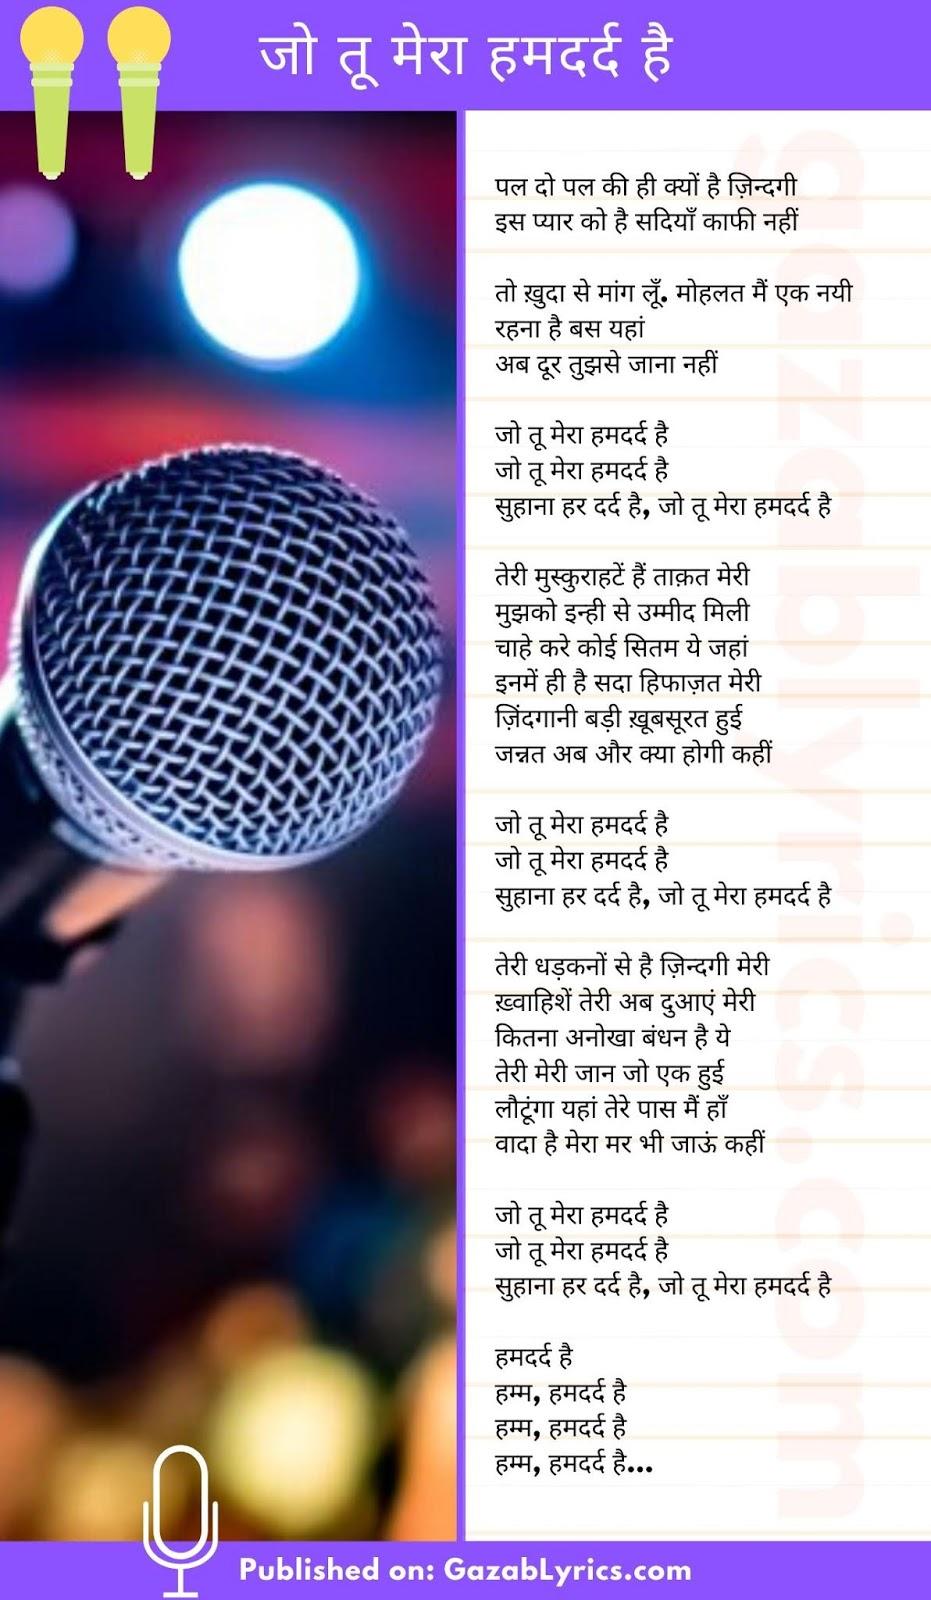 Humdard song lyrics image